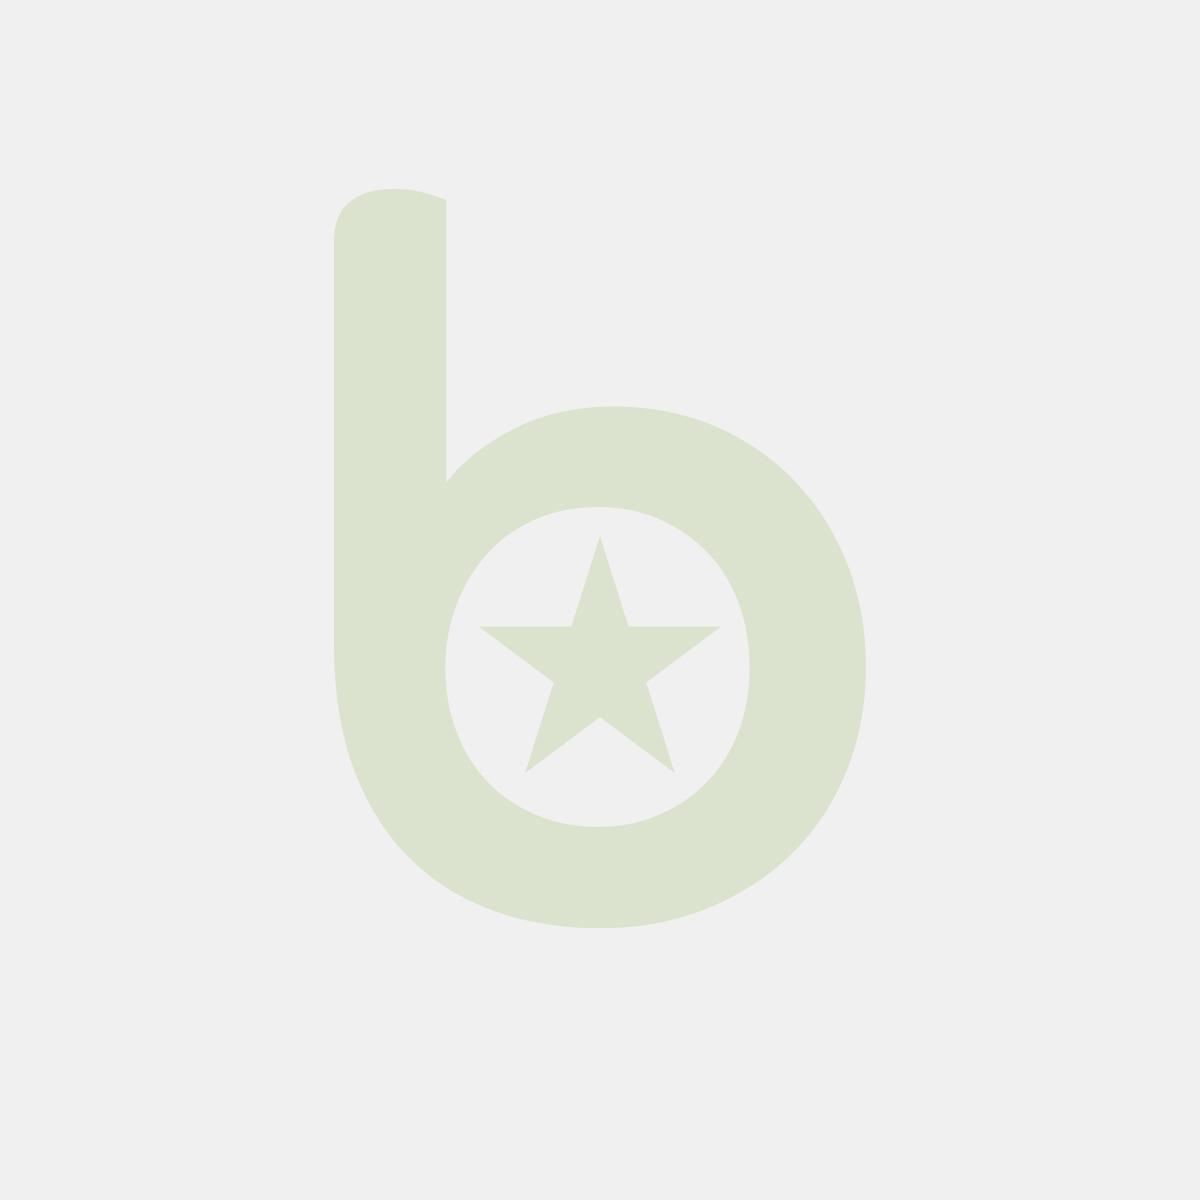 LUCART dyspenser serwetek TableTurn N4 obrotowy 360